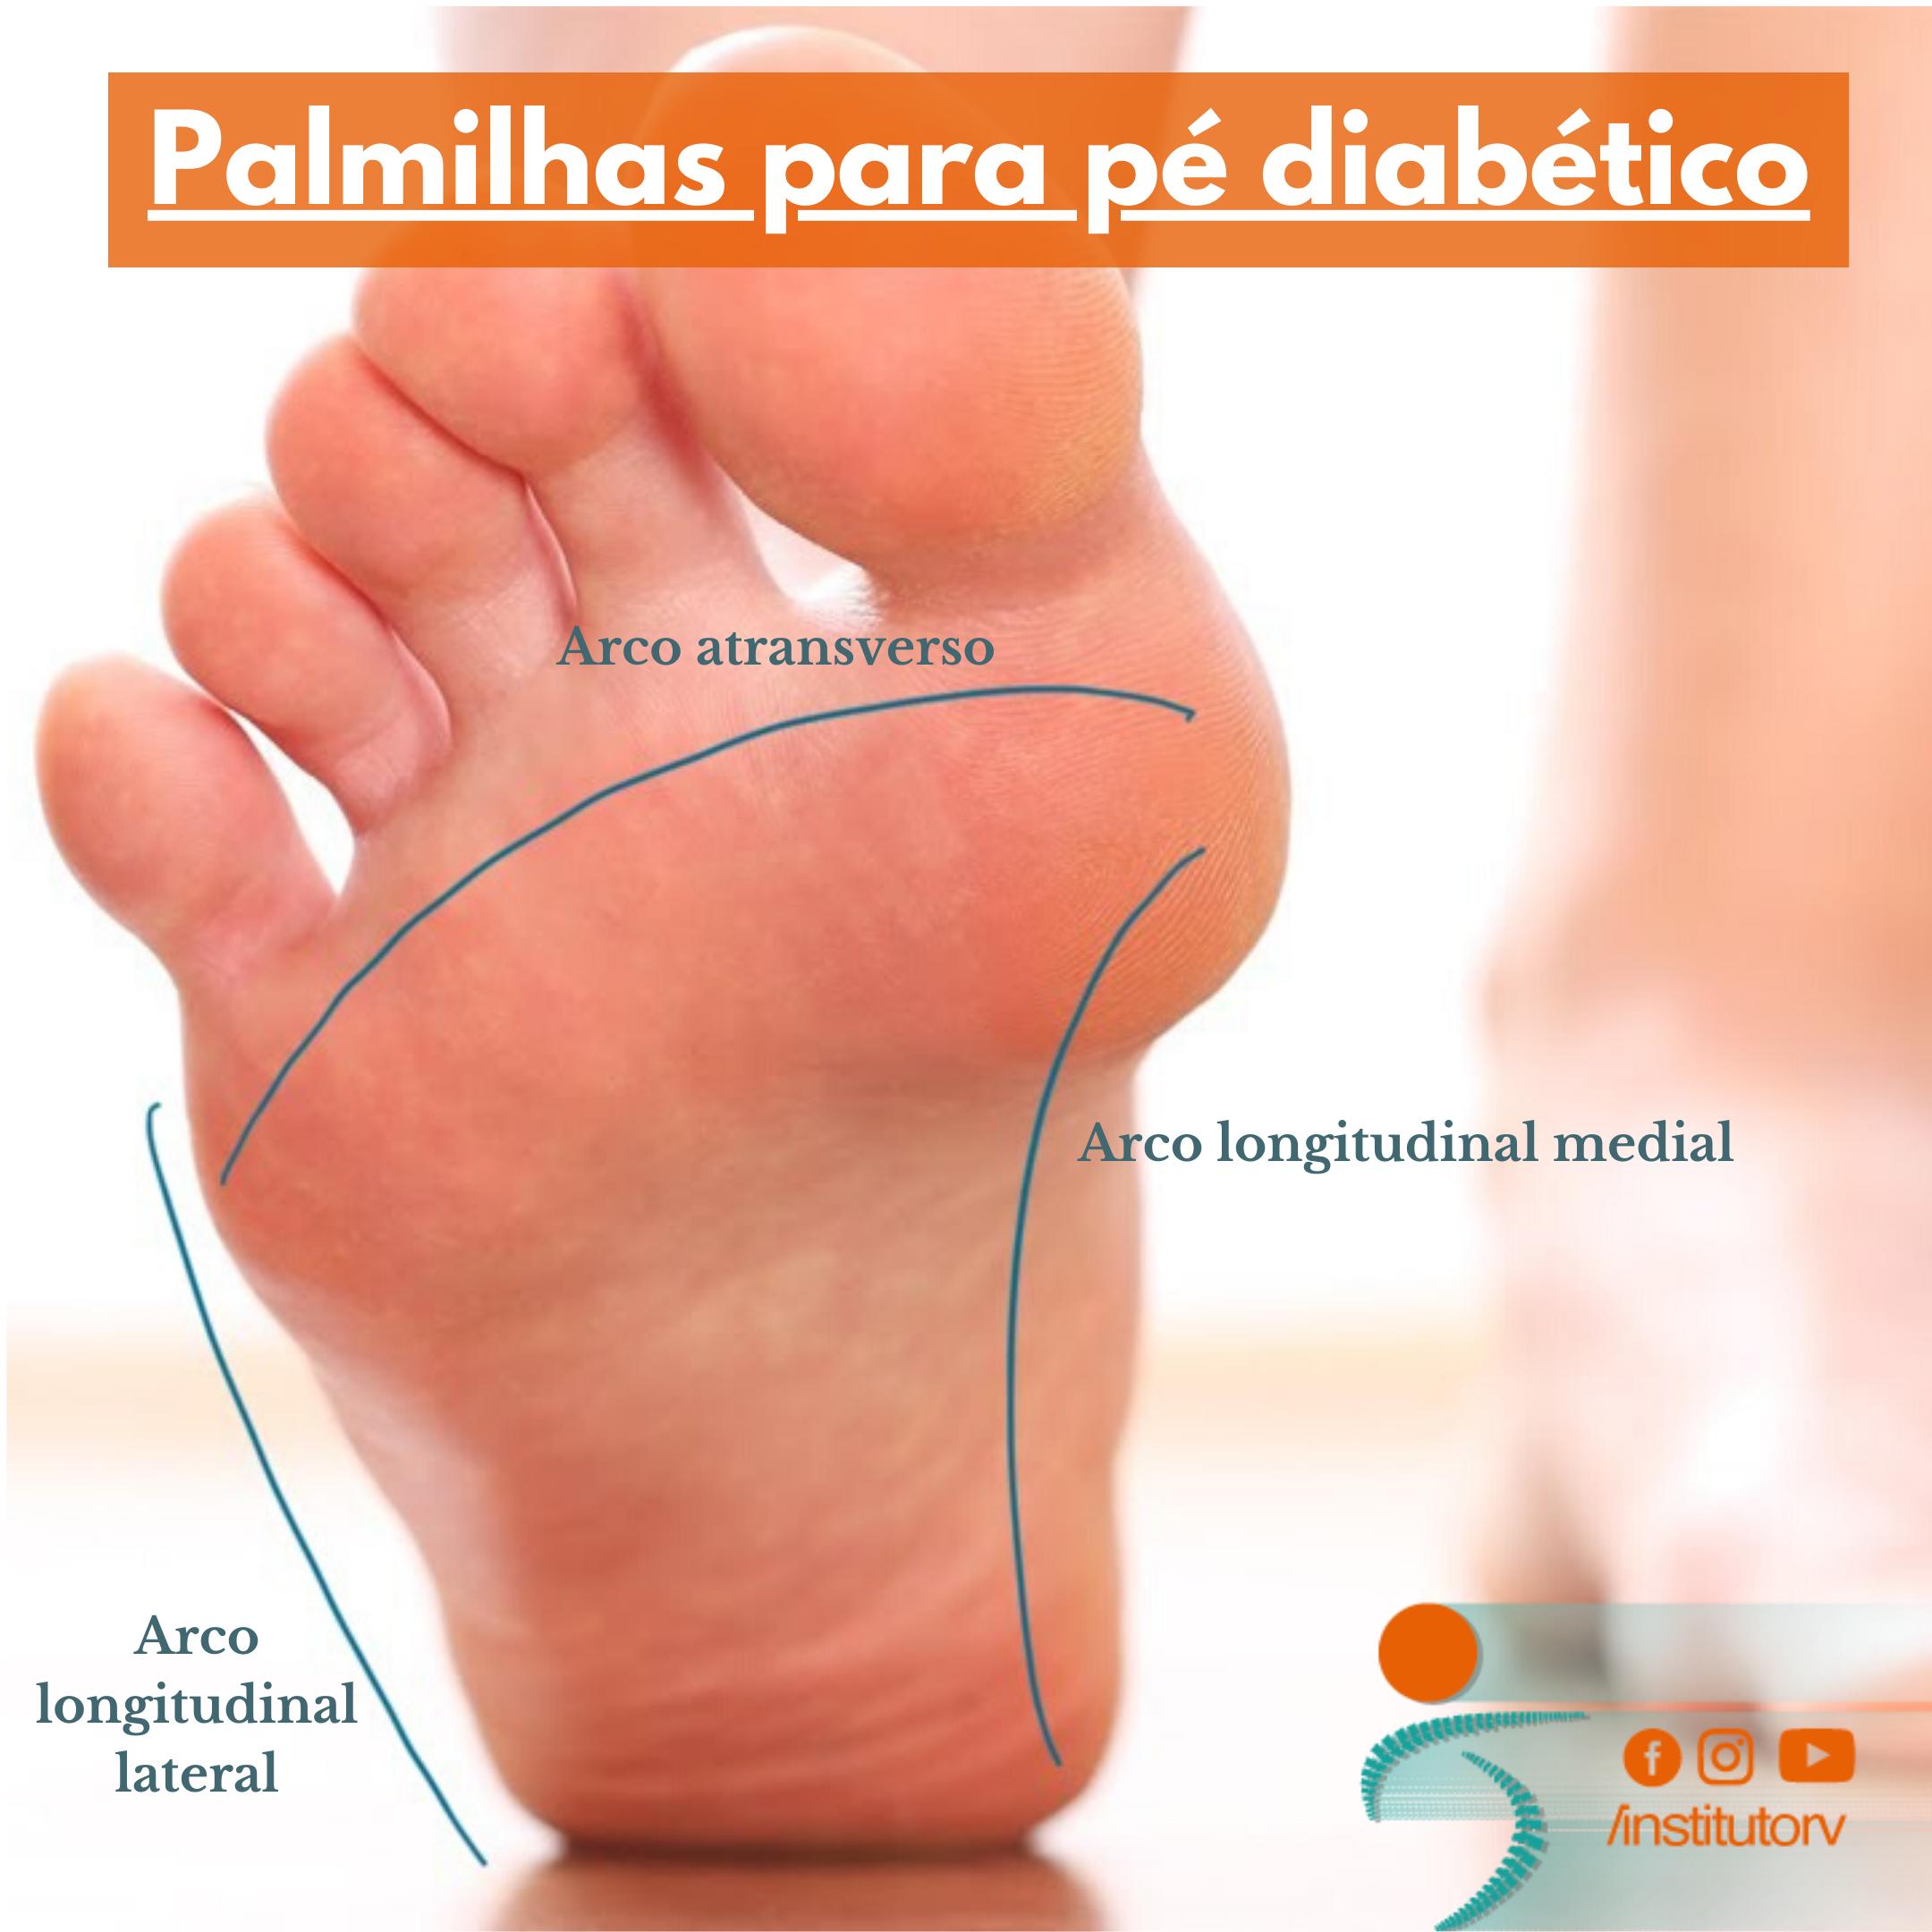 Palmilhas para pé diabético